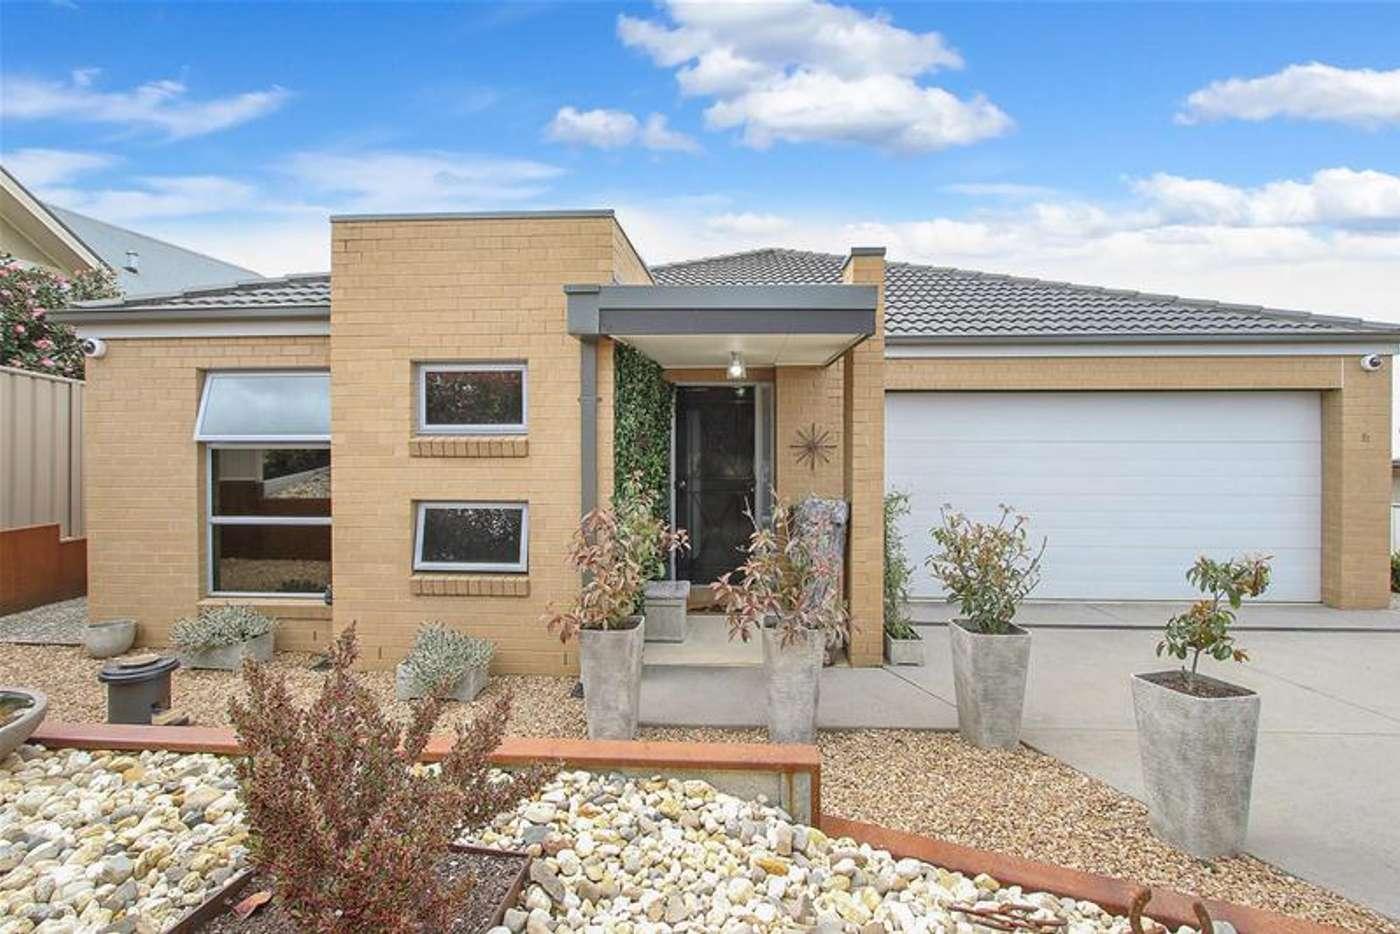 Main view of Homely house listing, 91 Yarralumla Drive, Wodonga VIC 3690